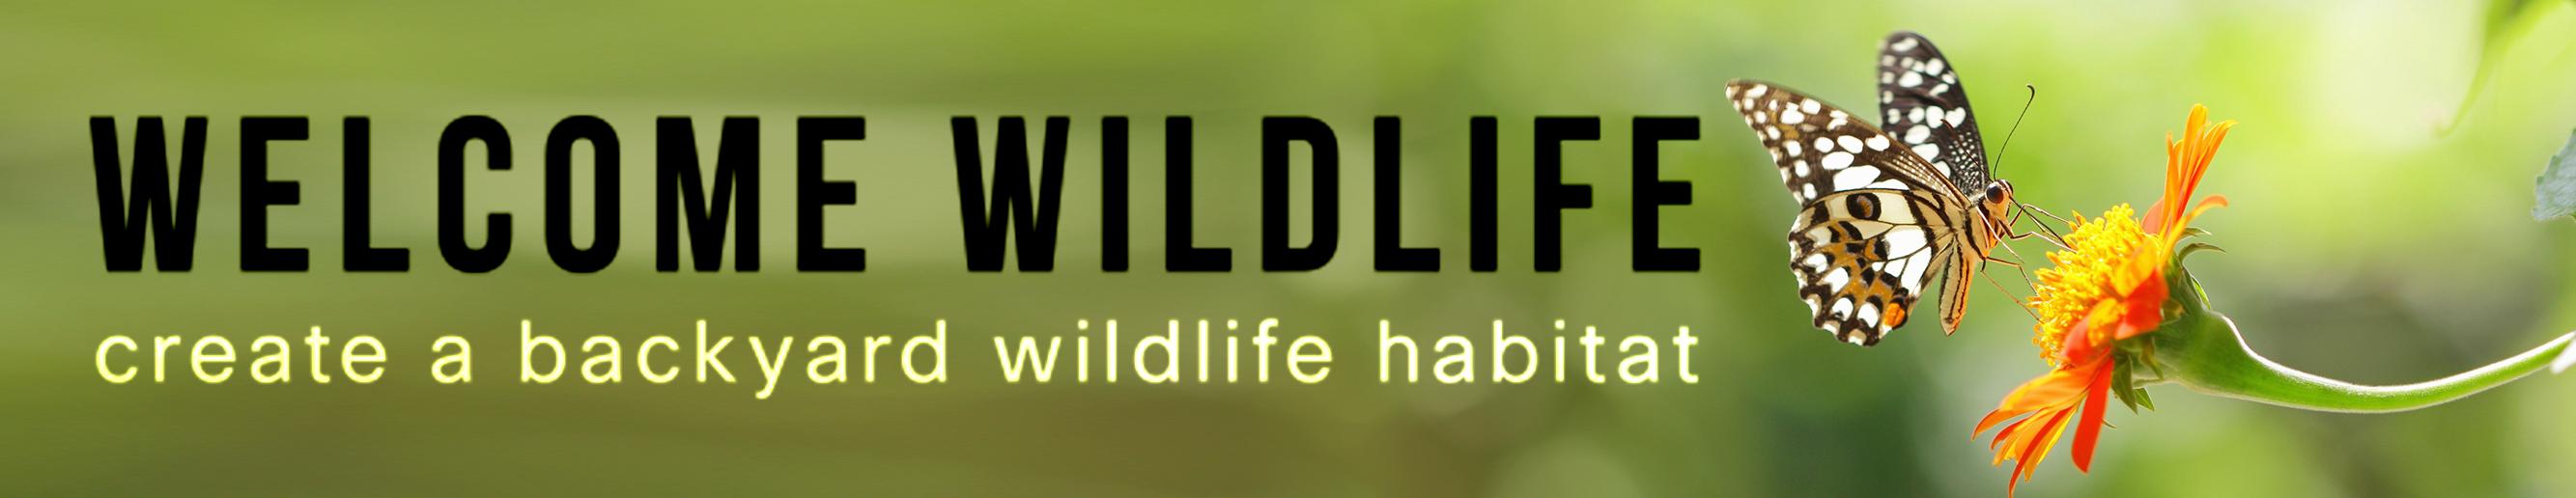 Welcome Wildlife